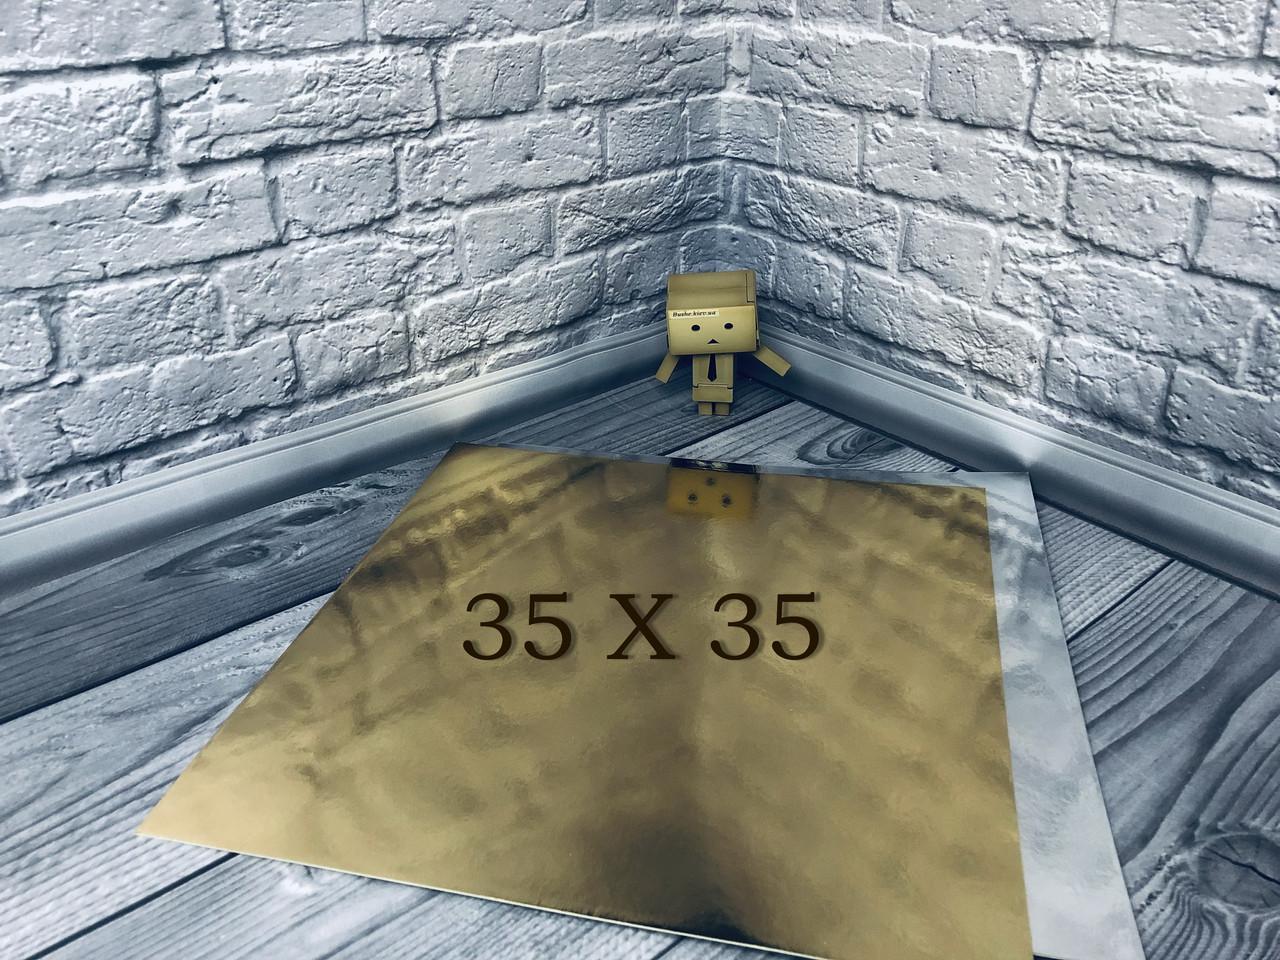 *10 шт* / Подложка для торта 35х35см, Золото-серебро, 350х350мм/мин. 10 шт.